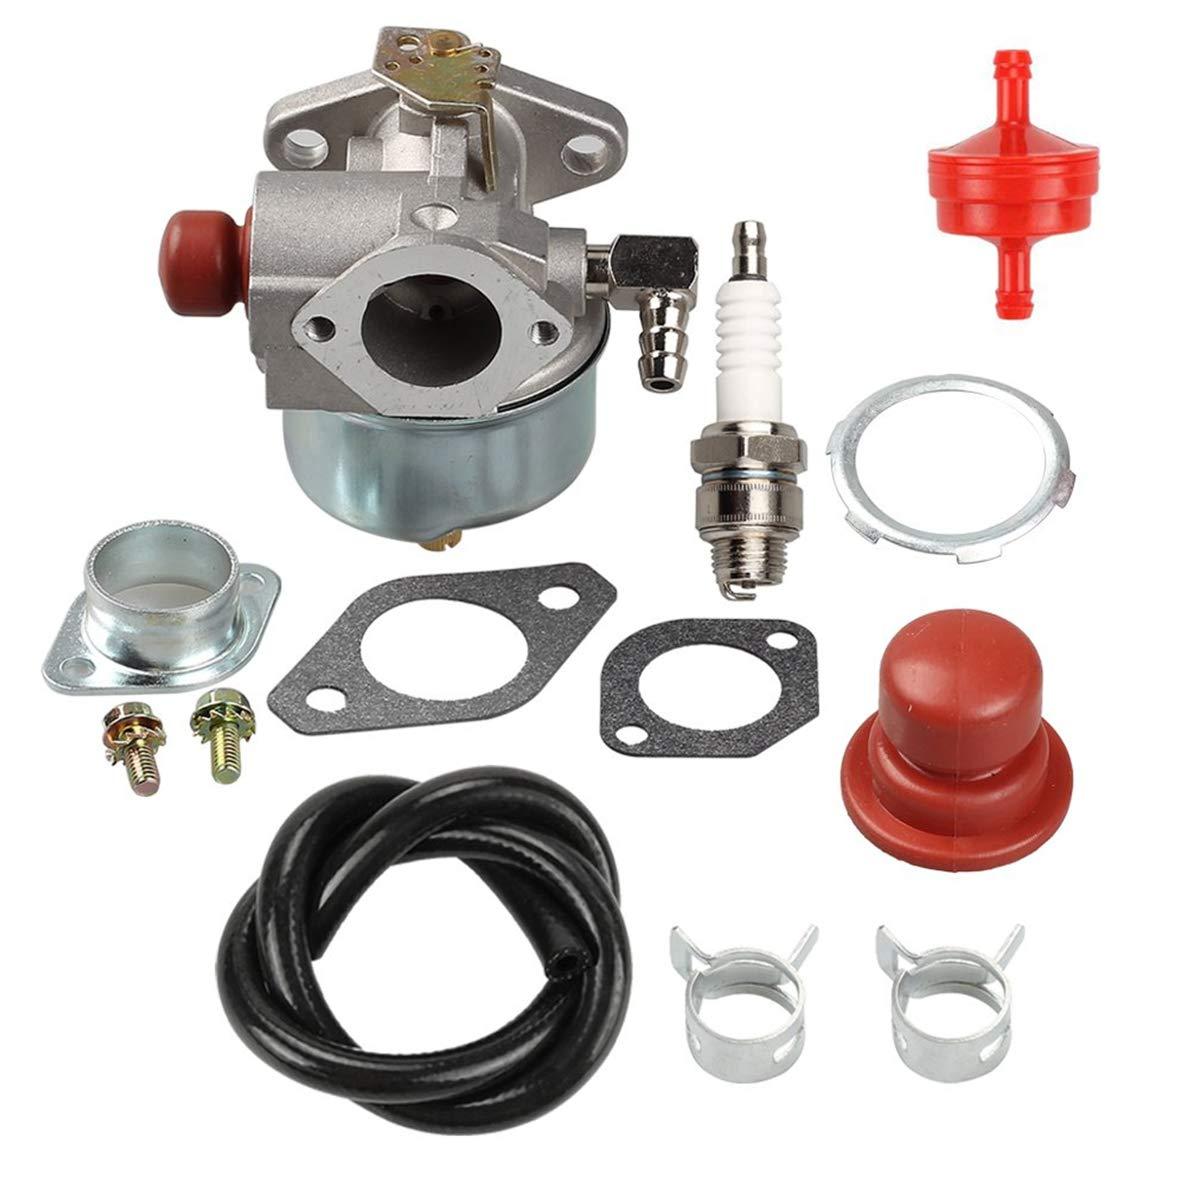 Notos 632795A Carburetor Carb Kit + Fuel Filter + Spark Plug Fit for Tecumseh 632046A 632078A 632099 TVS90 TVS105 TVS115 TVS120 TVS75 TVS100 ECV100 Engine 4.5HP 5HP Craftsman Eager 1 Lawnmower